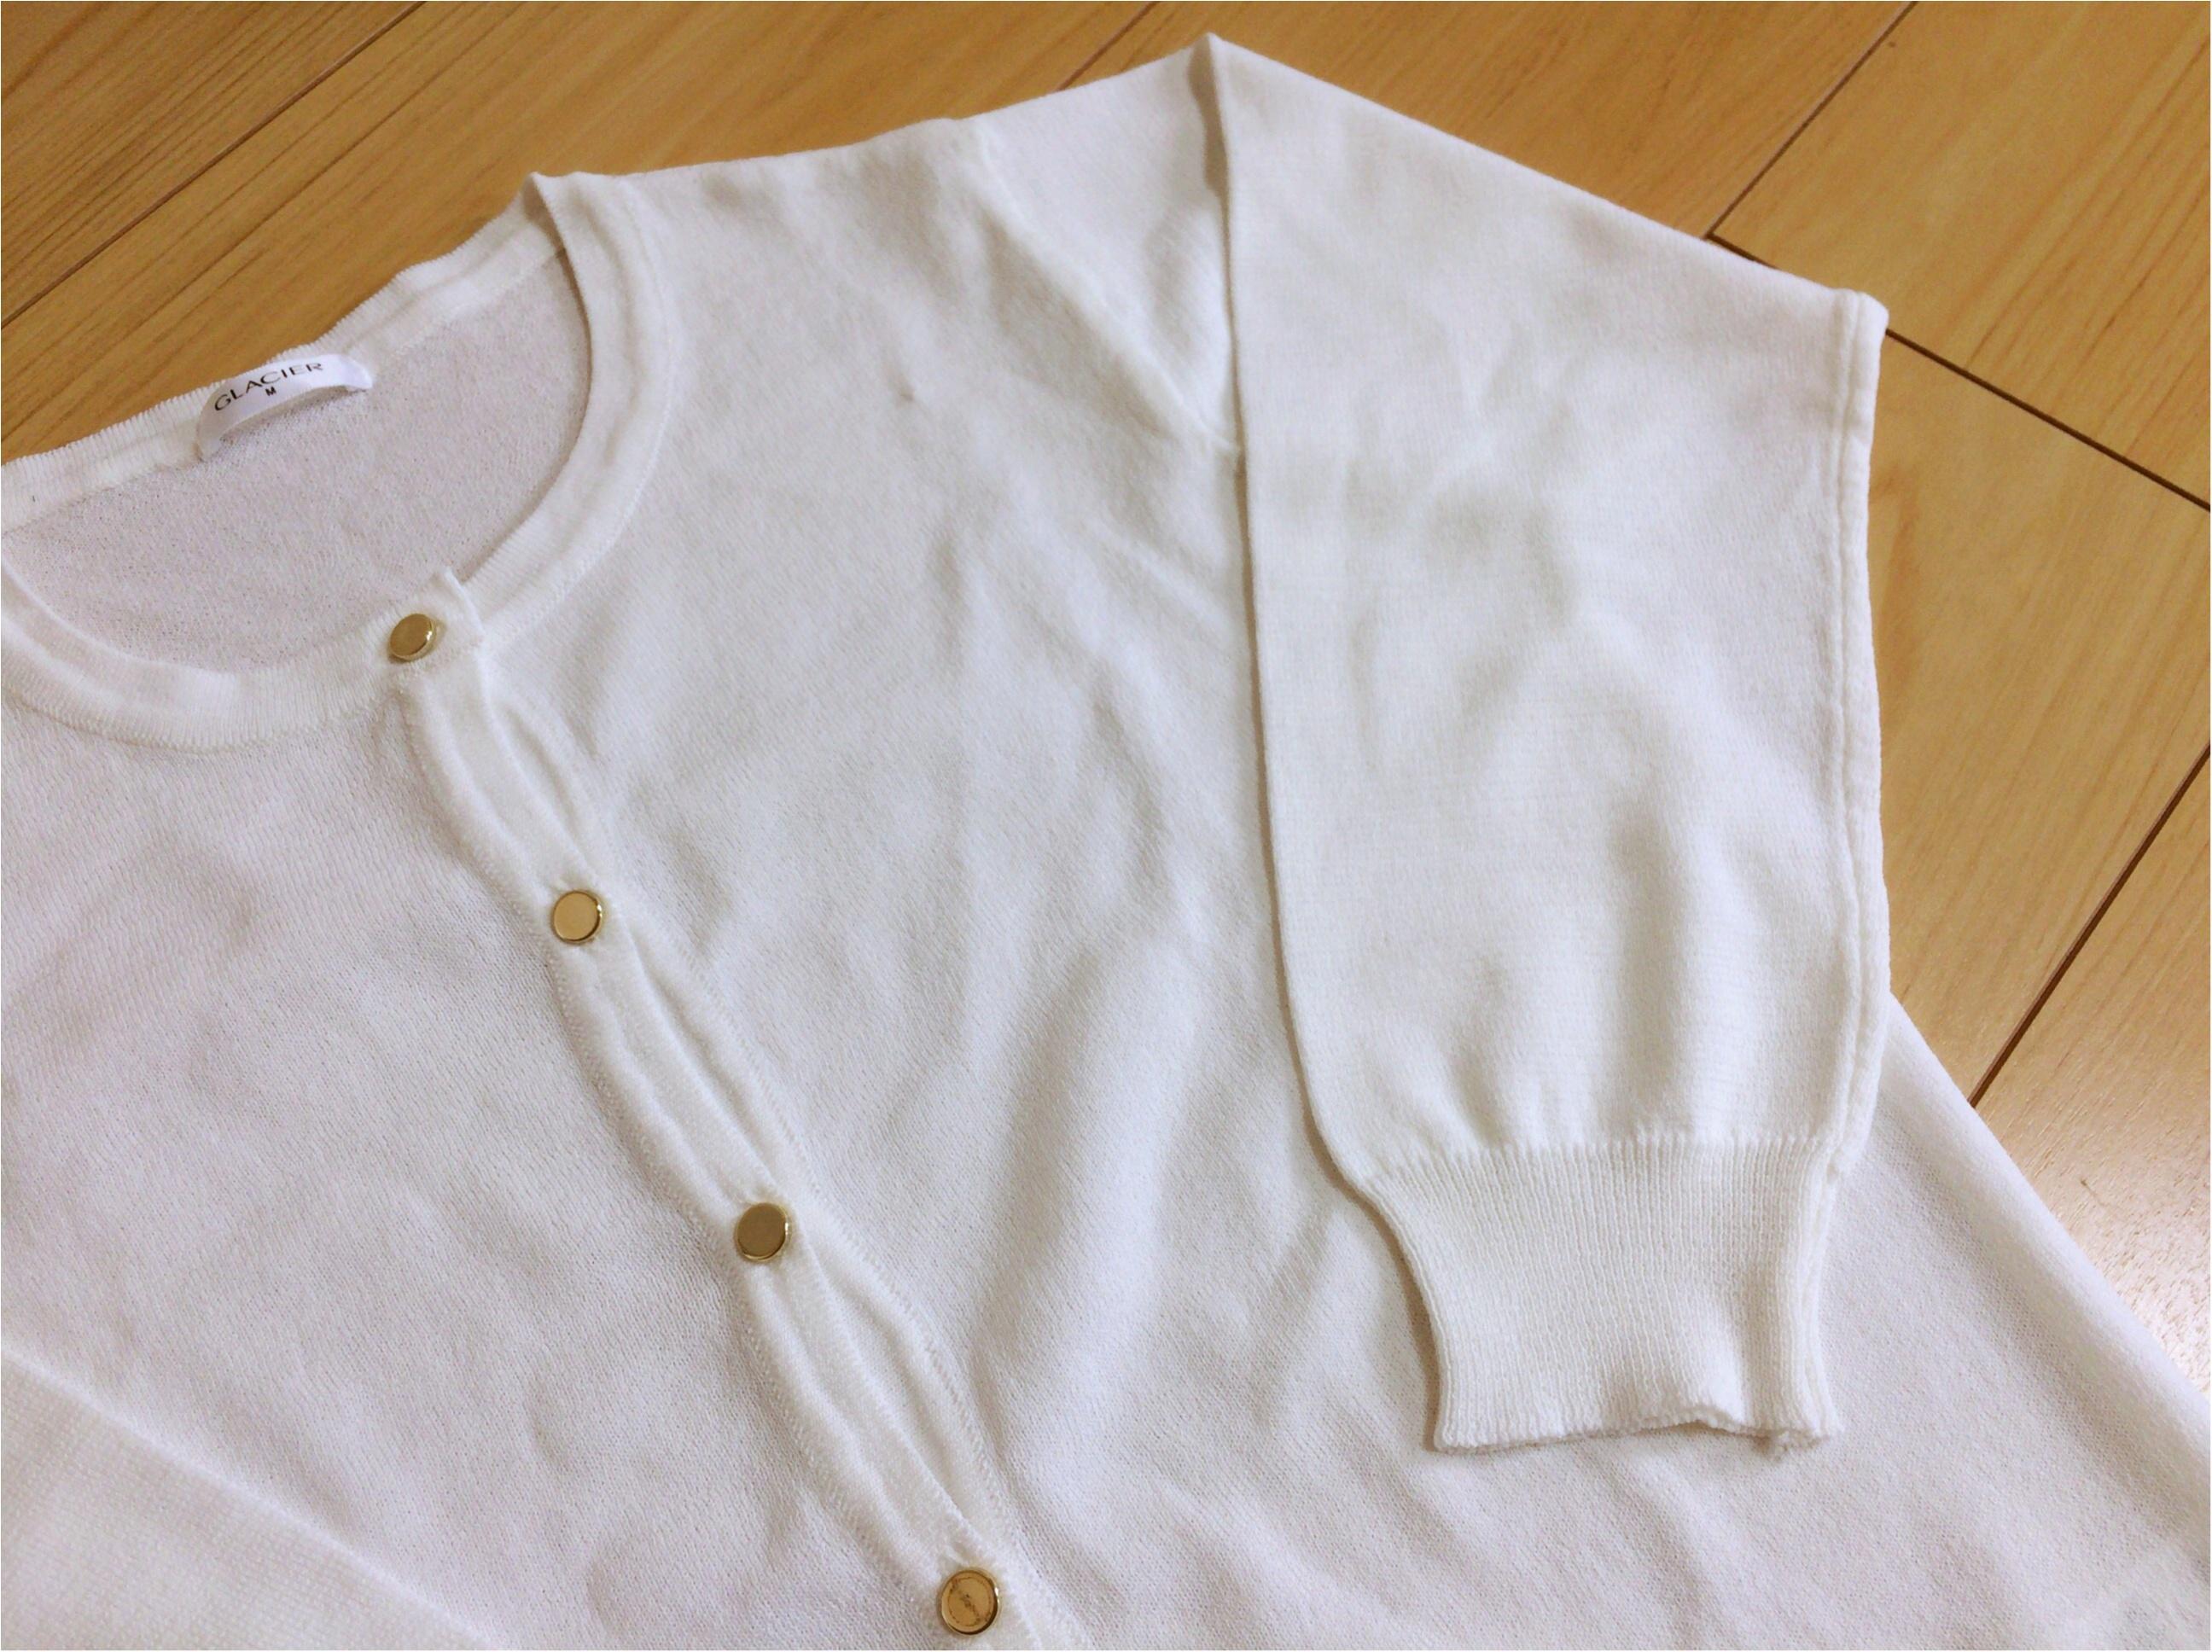 【SALE】プリプラ!《Honeys》可愛い♡流行り刺繍ブラウスと定番白カーディガンを♡_6